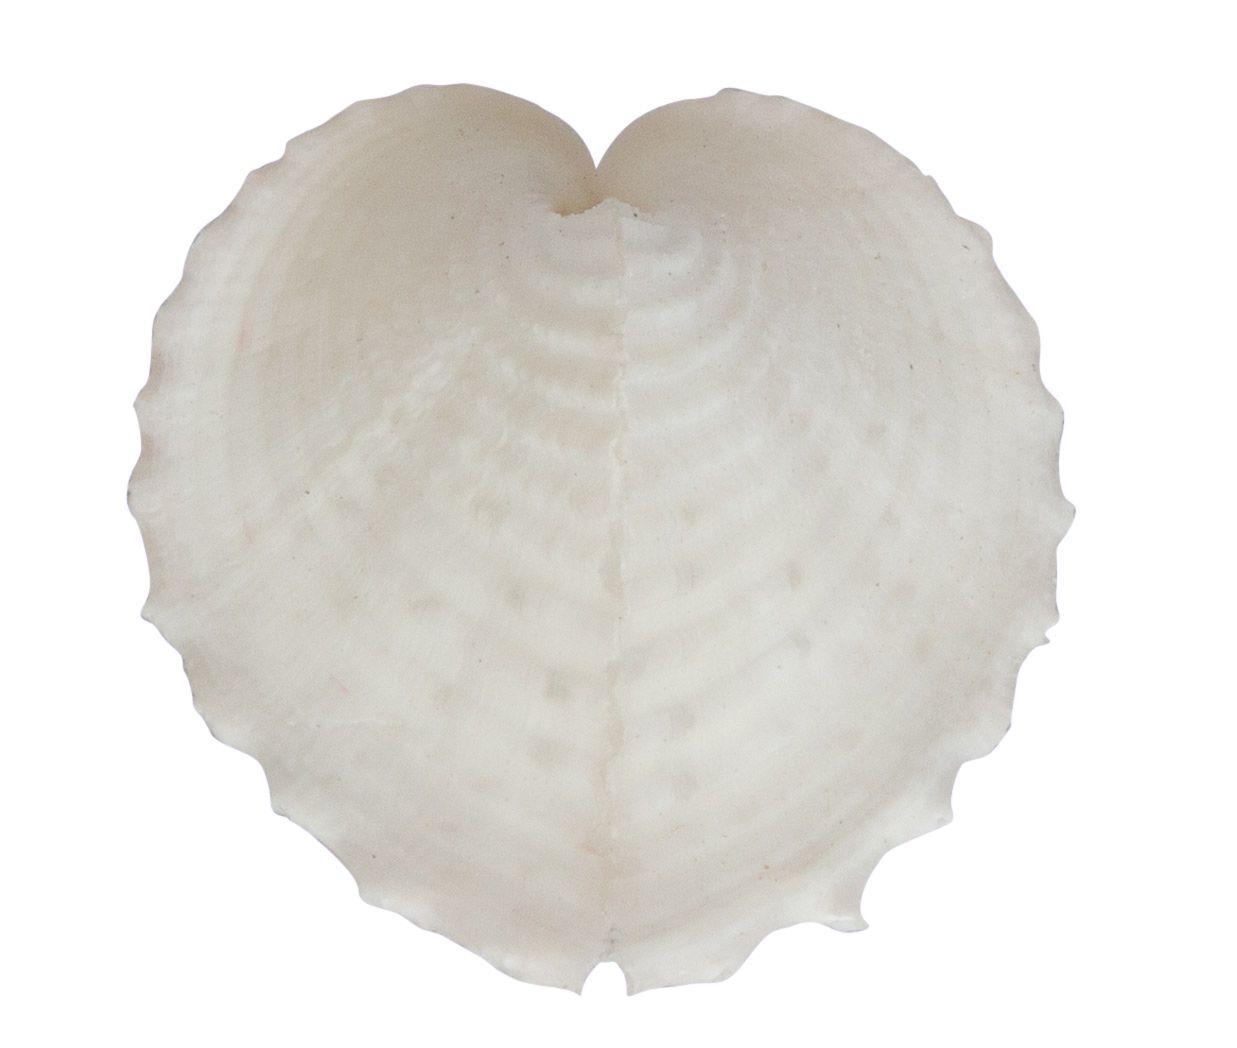 heart shell white small 2,5 x 2 cm tot 3 x 2,5 cm